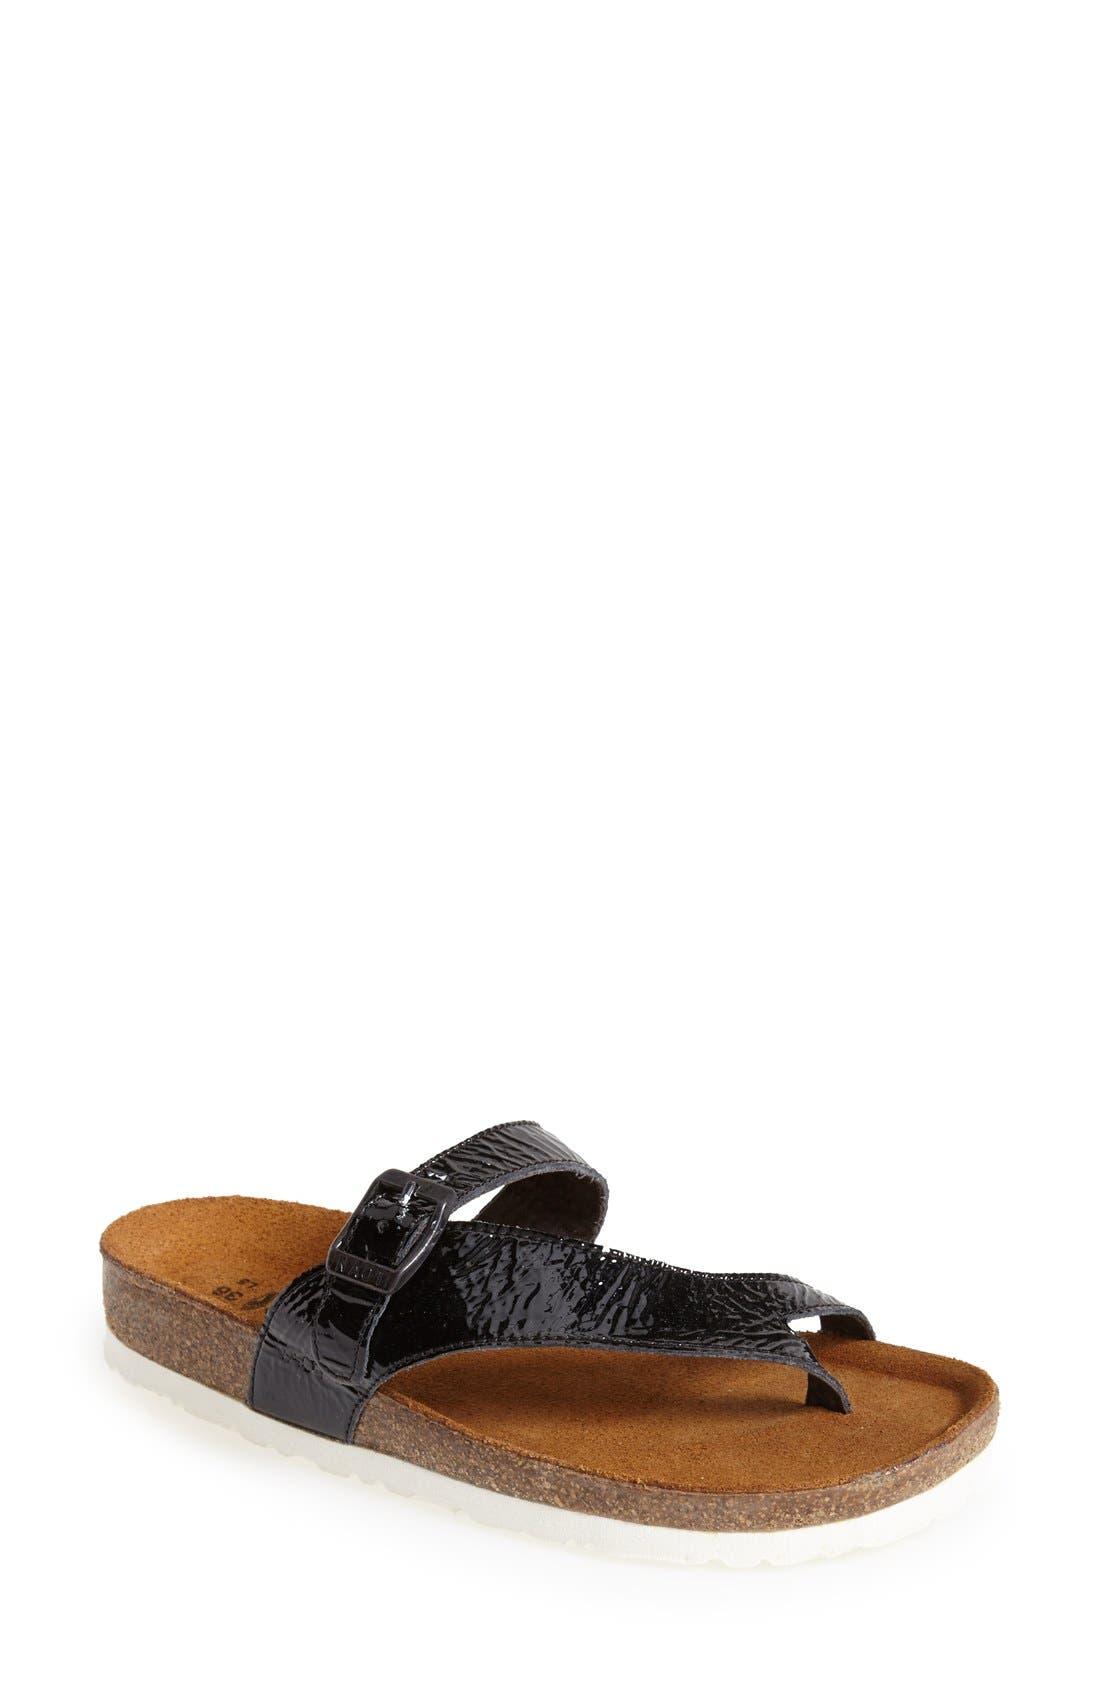 NAOT Tahoe Sandal